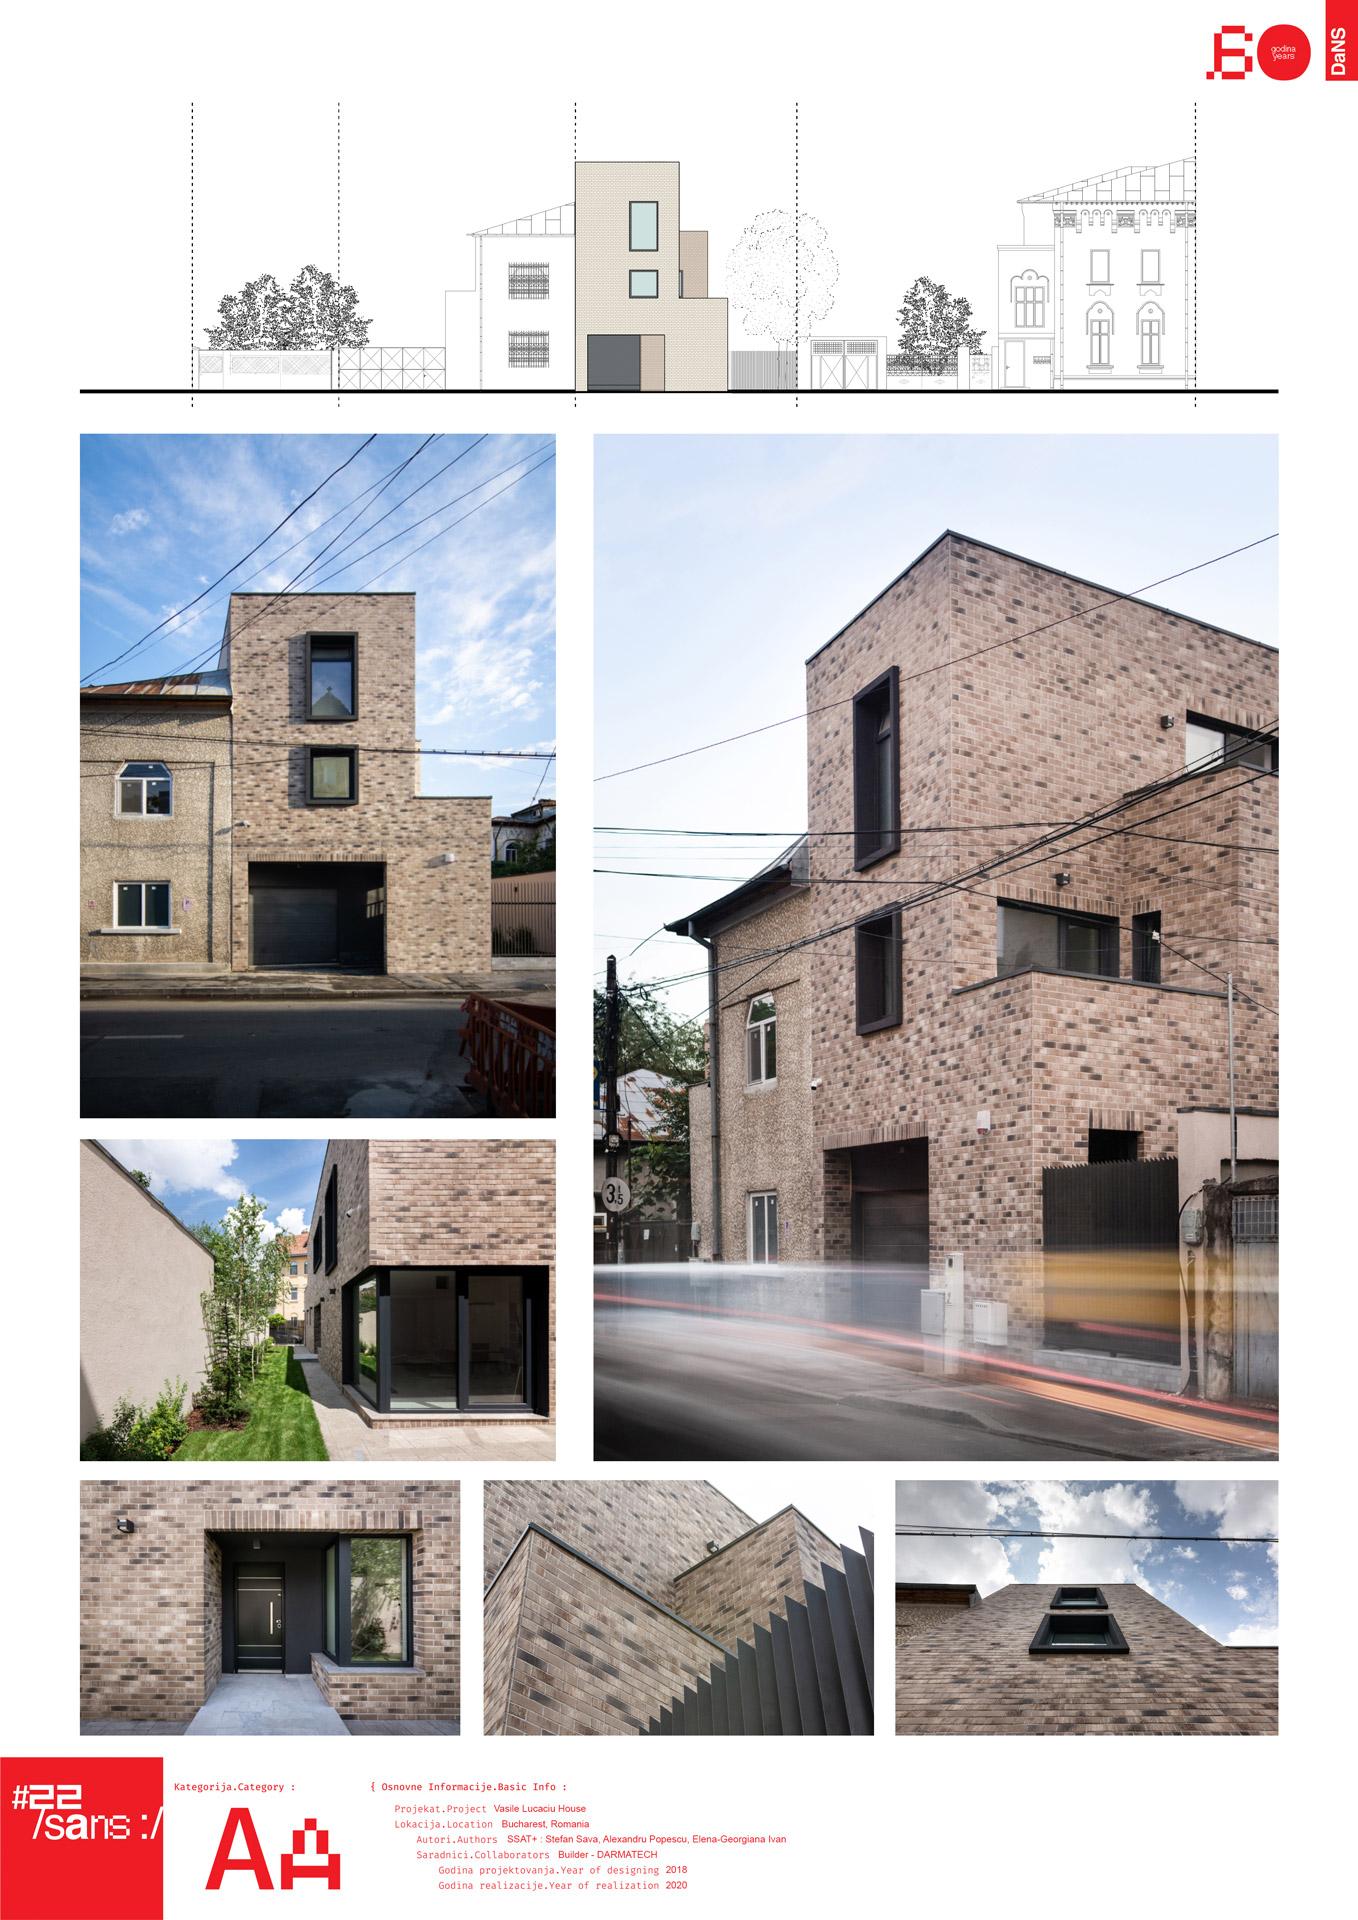 "<p class=""naslov-br"">aa20</p>Urbana kuća / Vasile Lucaciu 112 // Urban House / Vasile Lucaciu 112"